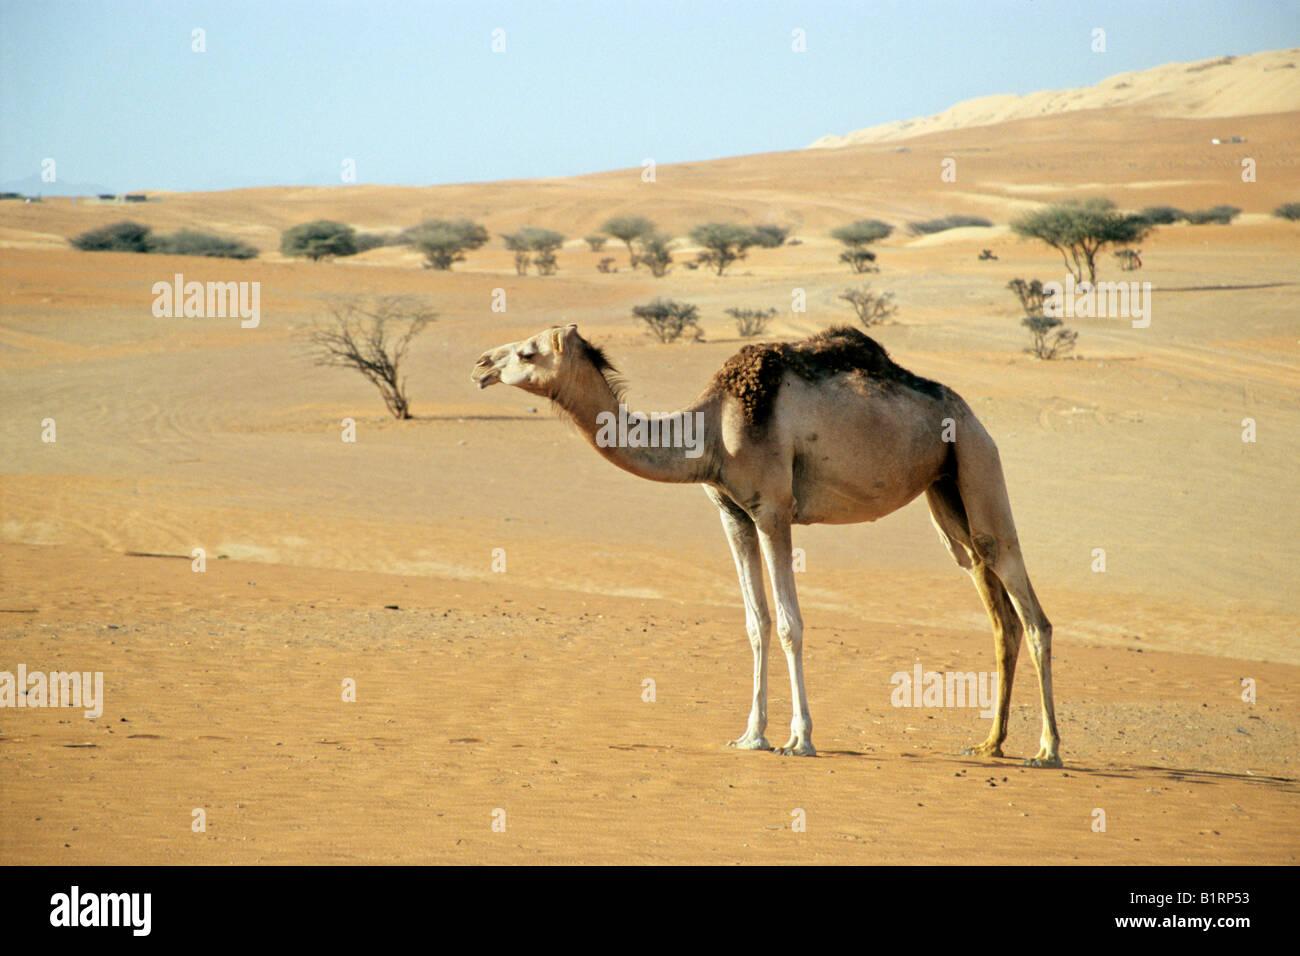 Dromedary Camel (Camelus dromedarius) in the desert in front of pines, Wahiba Sands, Oman, Arabian Peninsula, Middle - Stock Image